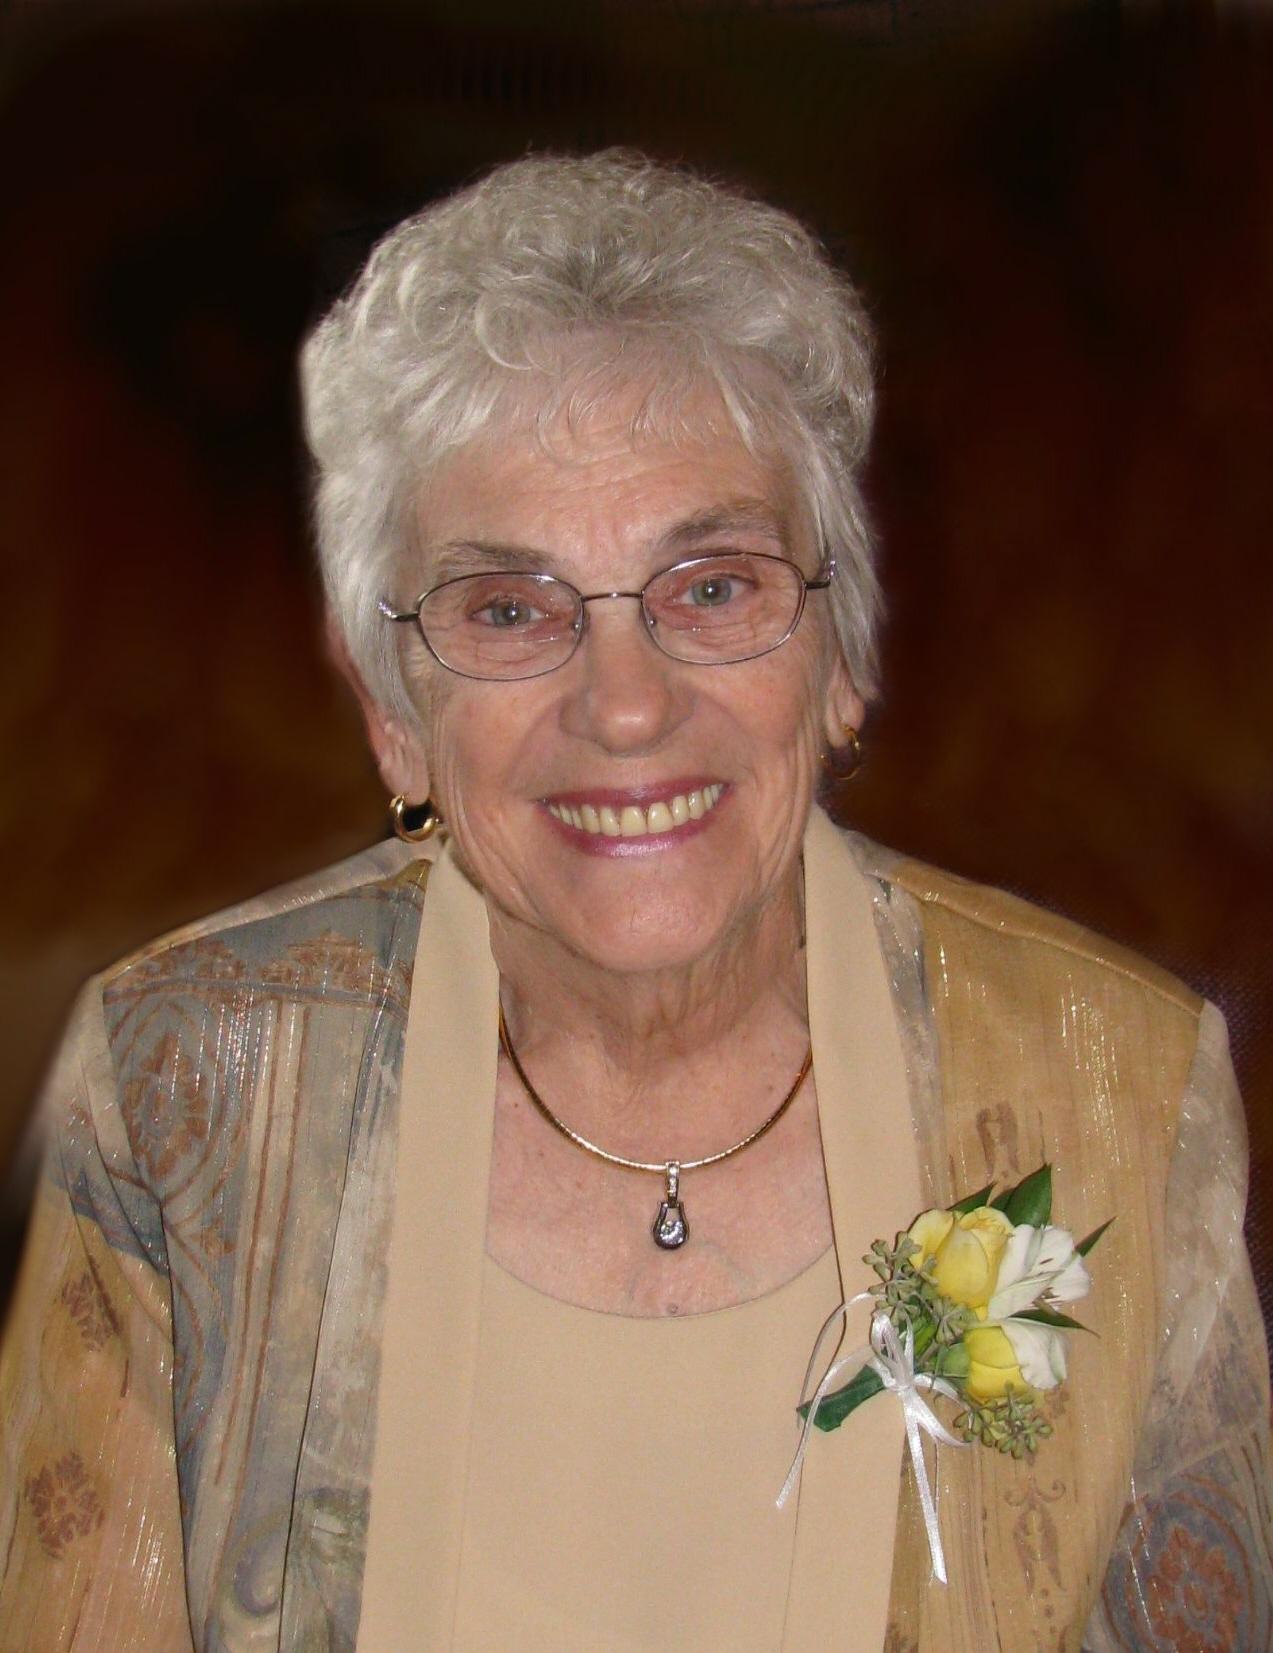 Barbara A  Morel Obituary - Visitation & Funeral Information